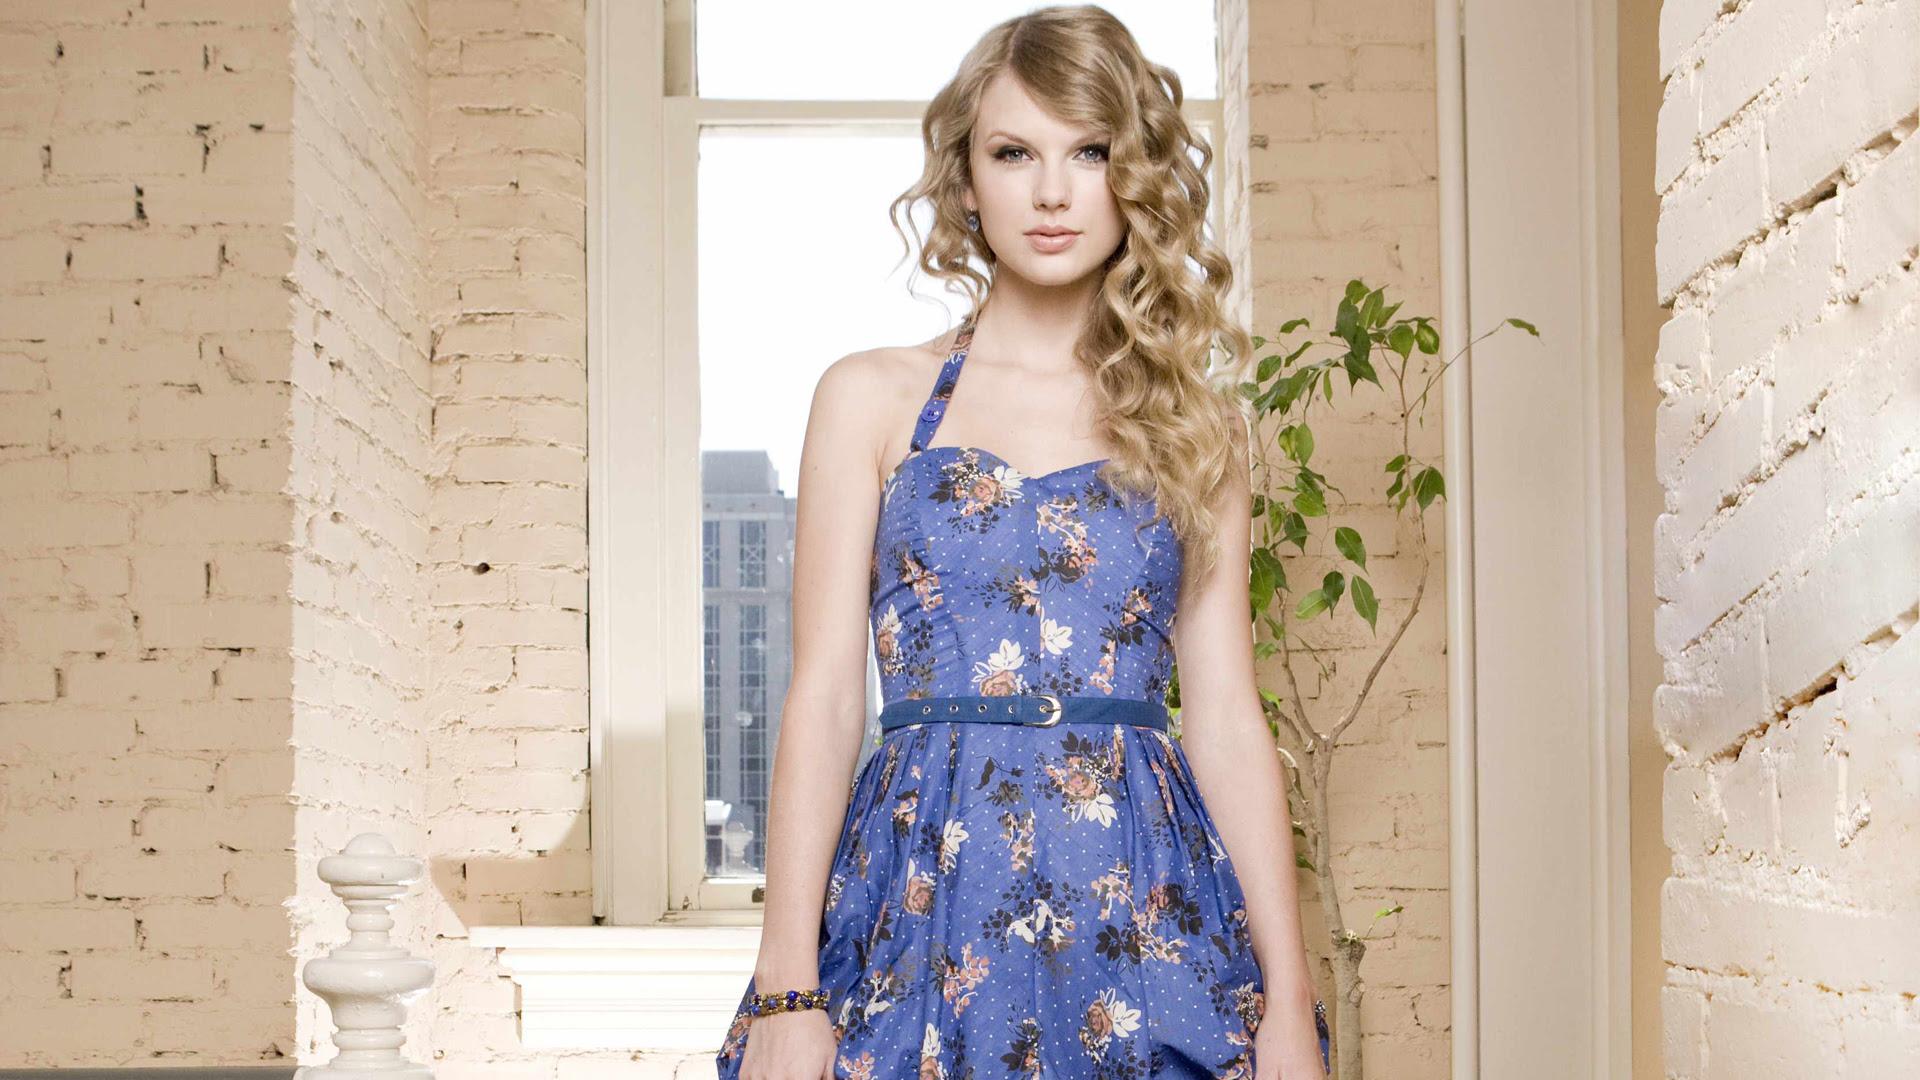 Taylor Swift Wallpaper HD Images | PixelsTalk.Net